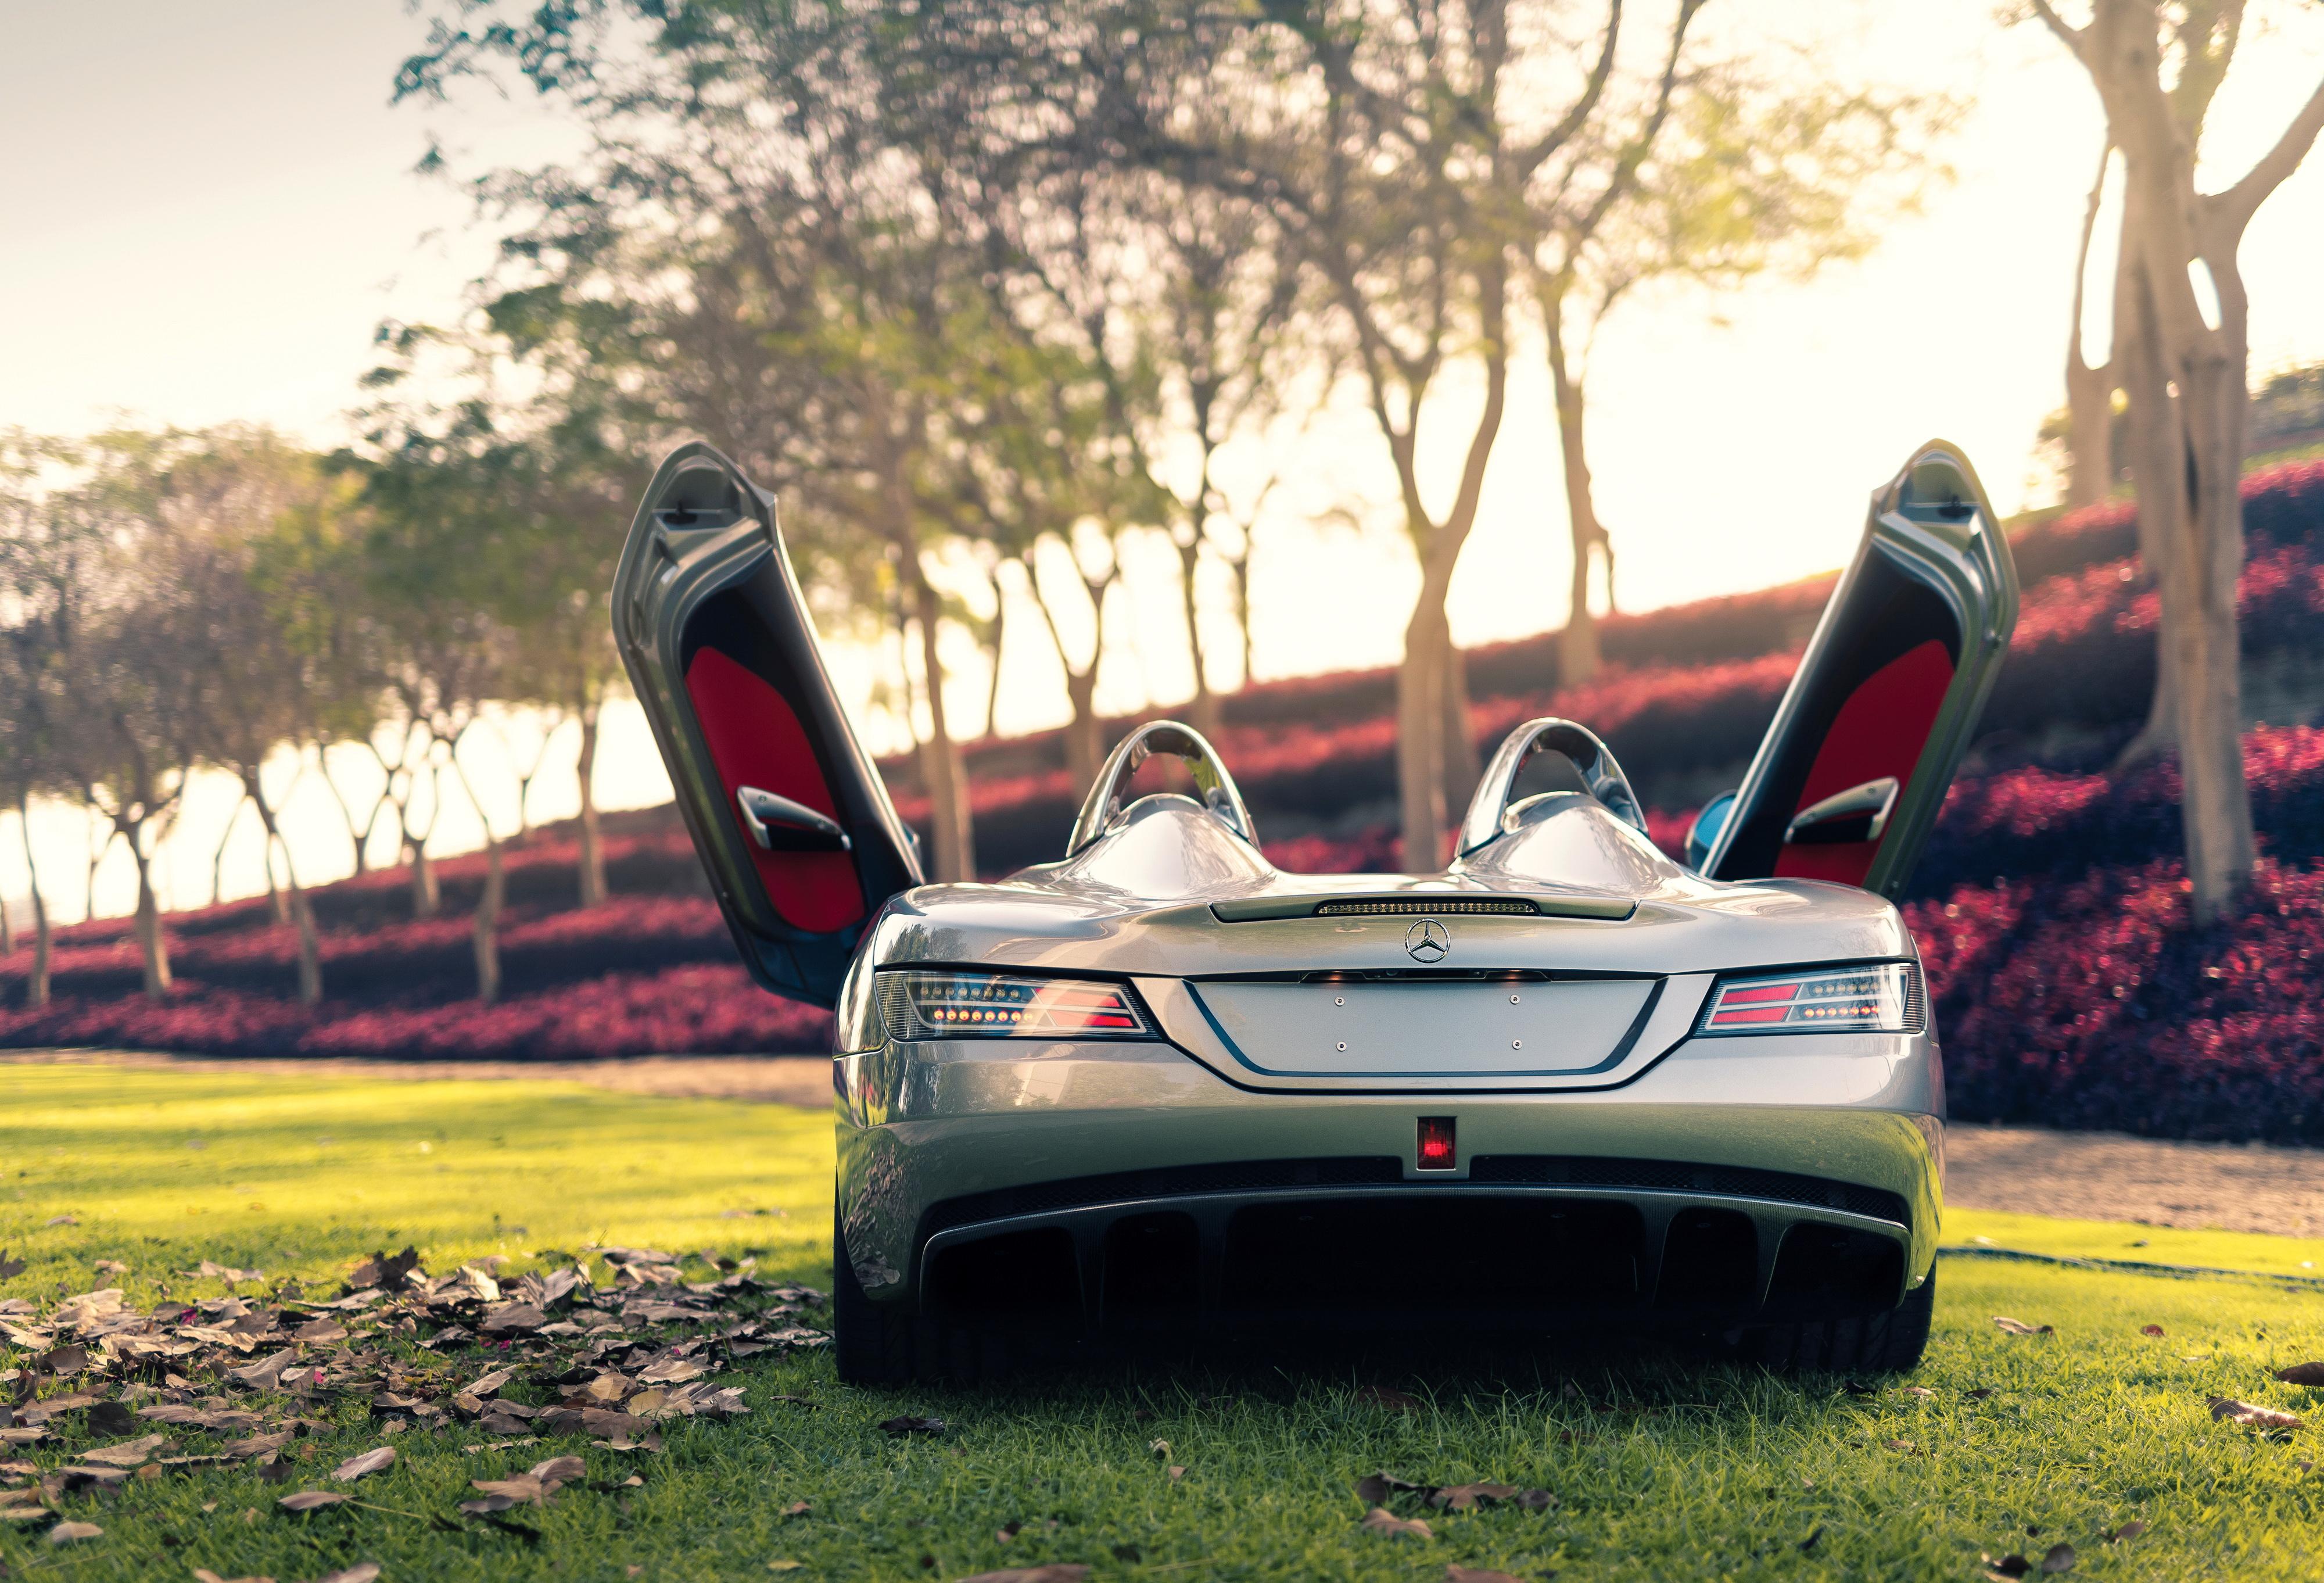 Mercedes Benz SLR McLaren 4k, HD Cars, 4k Wallpapers ...